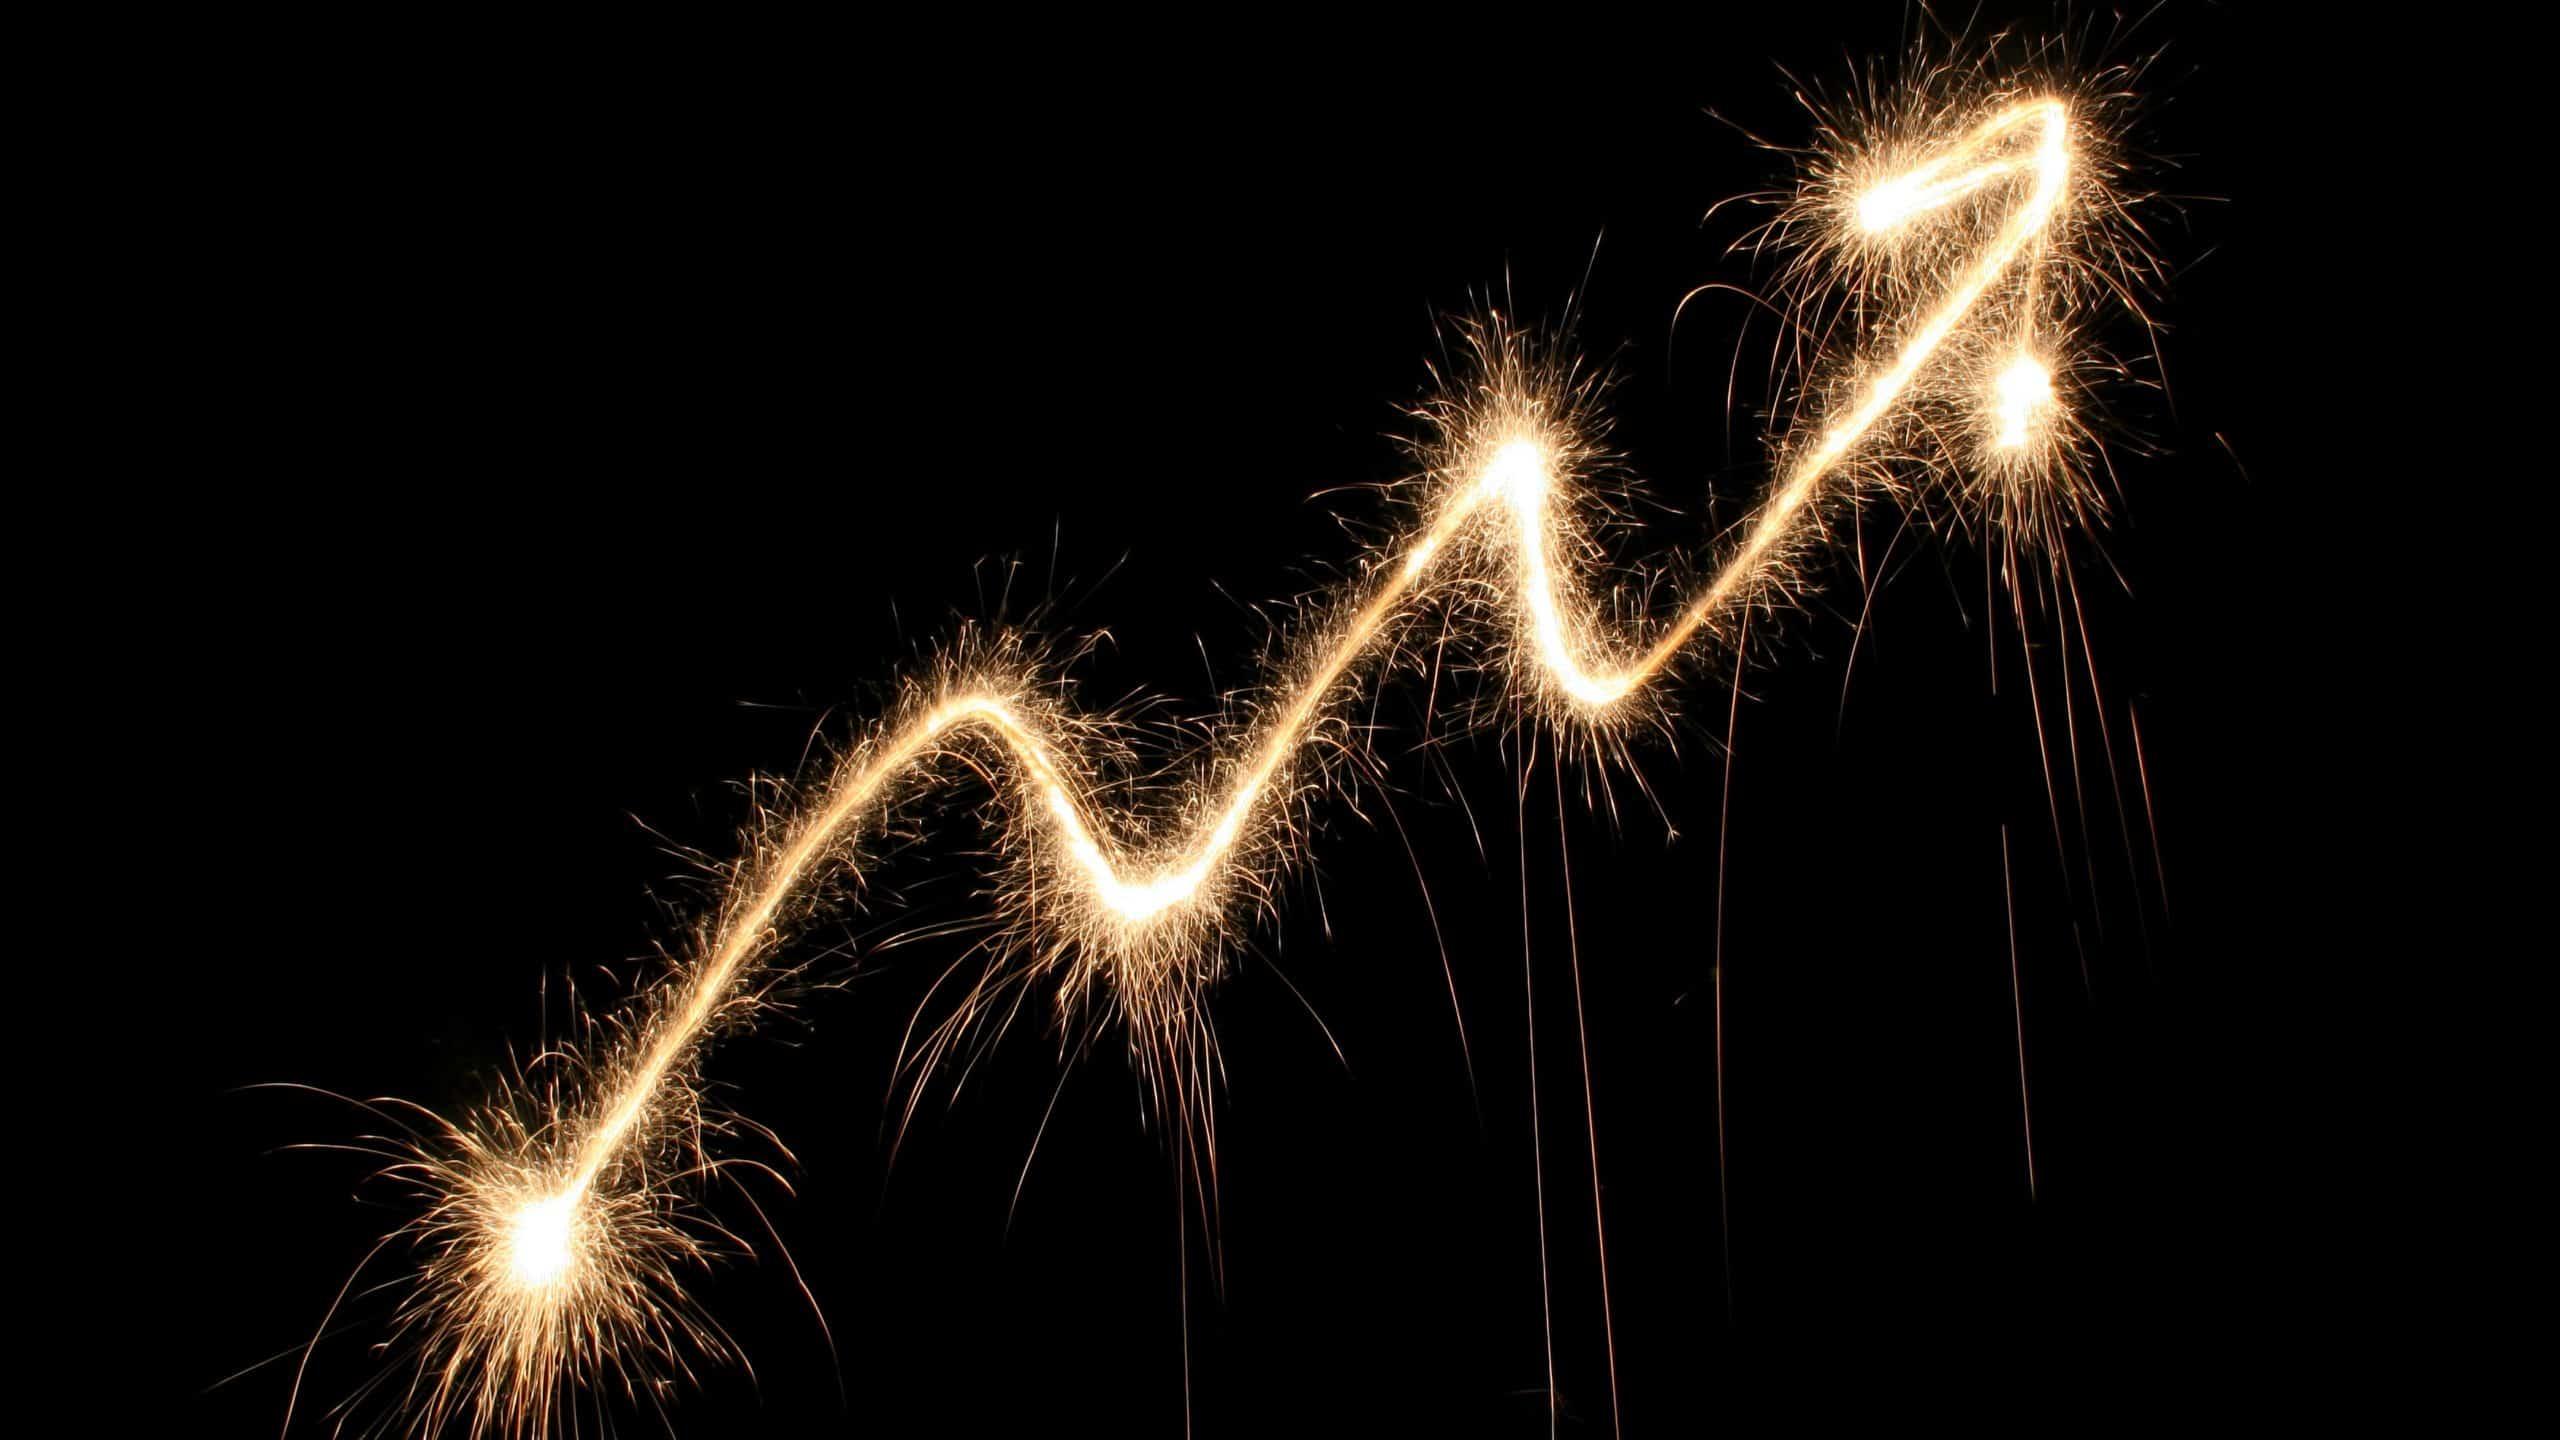 upward trending arrow made from fireworks display